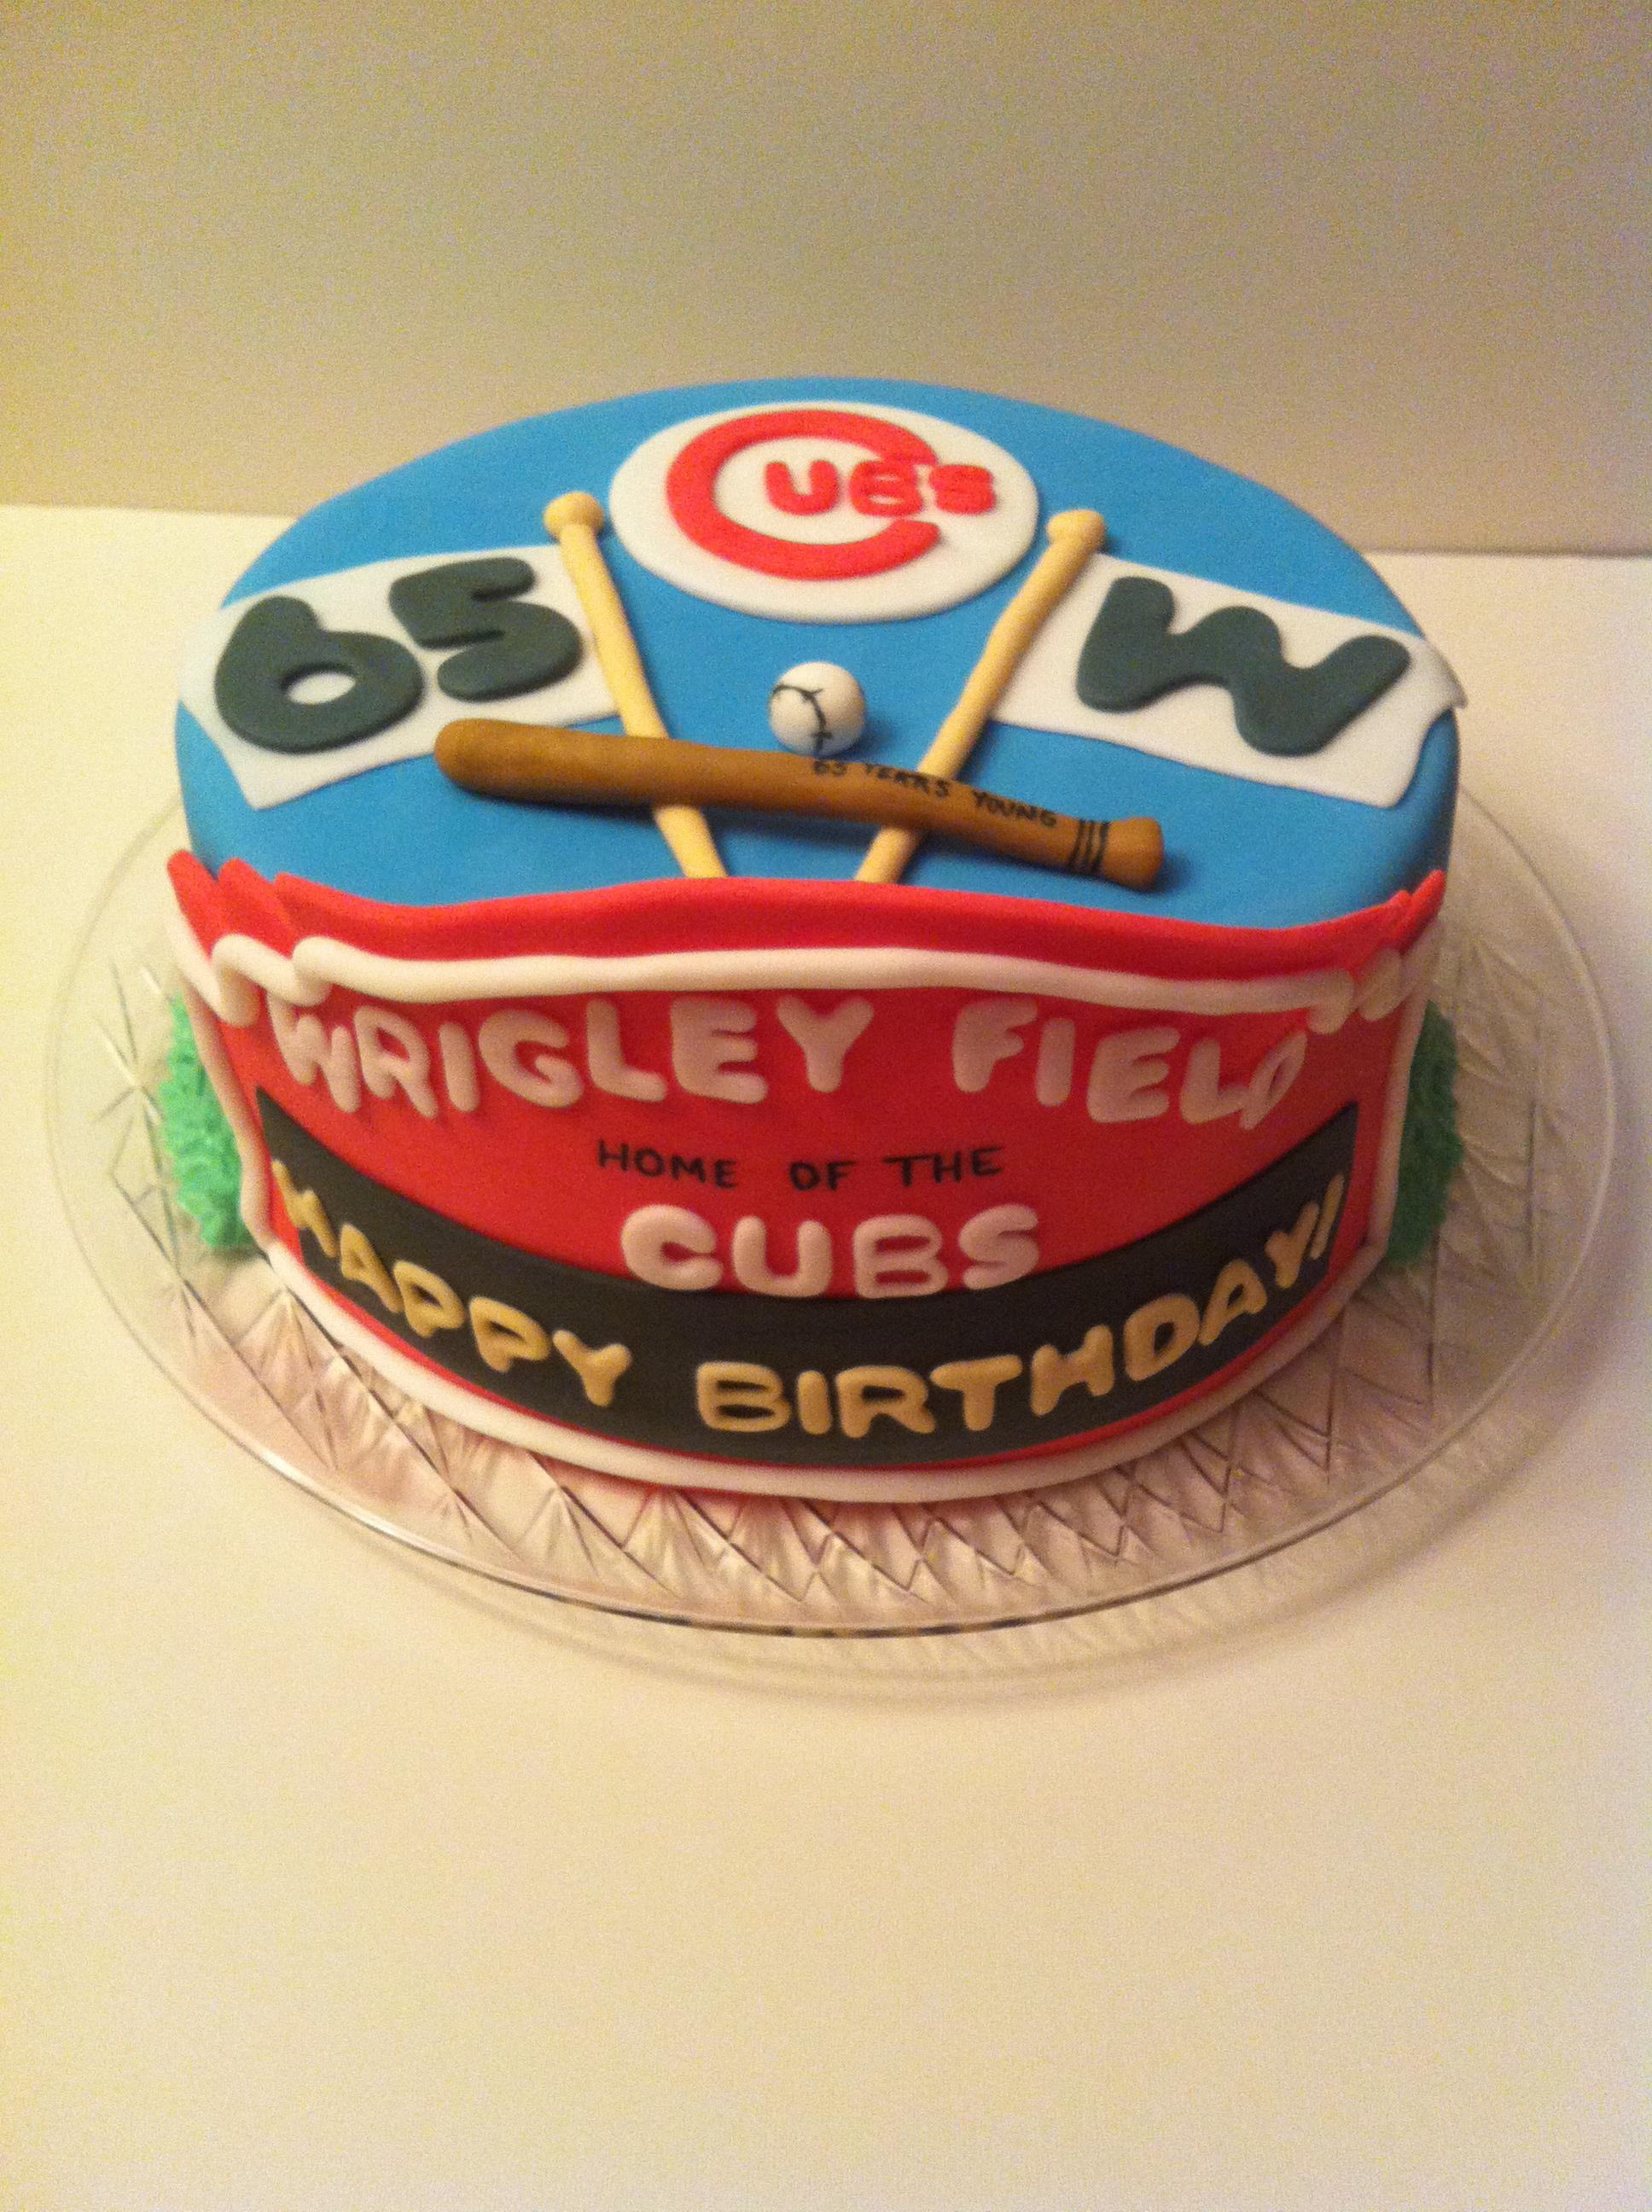 6 Cubs Happy Birthday Jeff Cakes Photo Chicago Cubs Happy Birthday